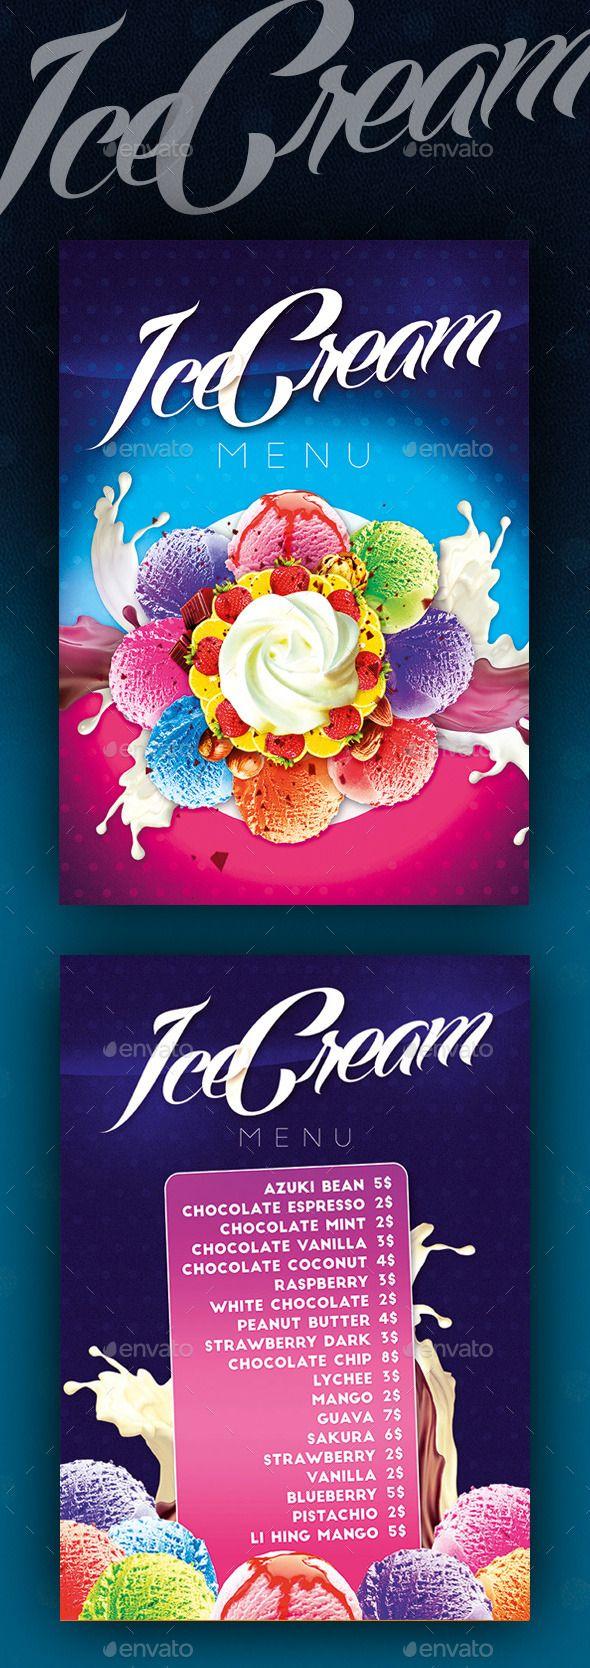 Ice Cream Menu II | Ice cream menu, Menu templates and Print templates